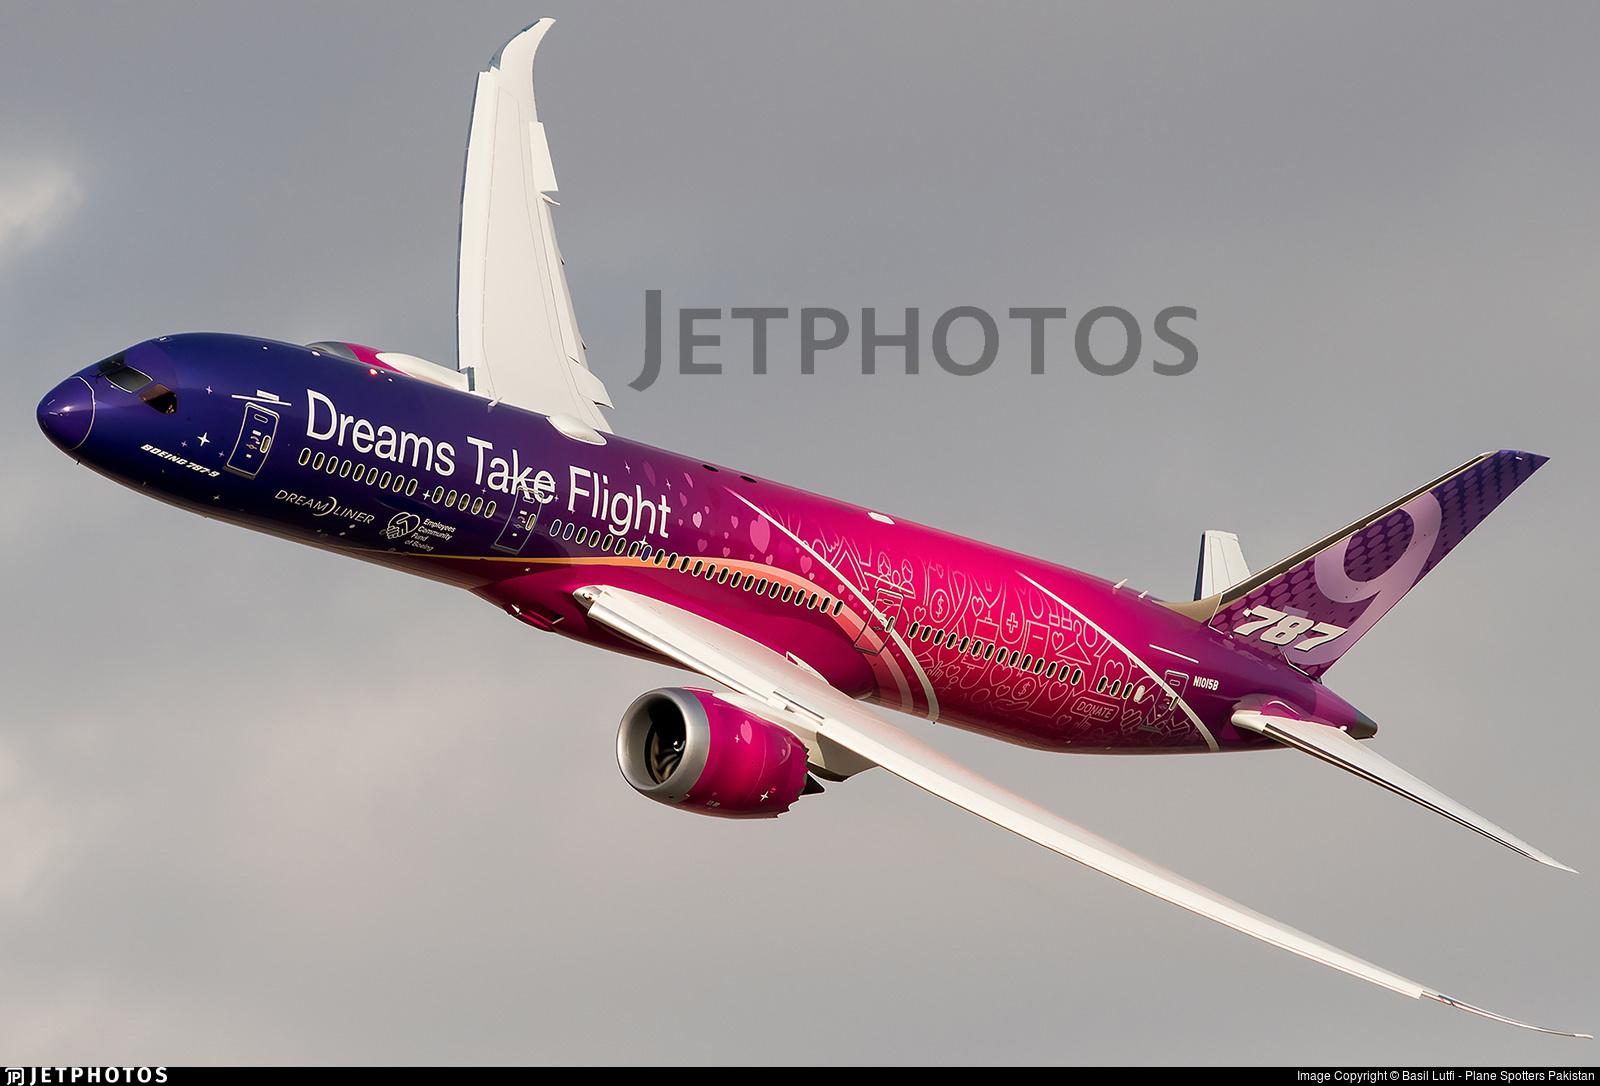 Boeing's Dreams Take Flight 787 performing at the Dubai Airshow